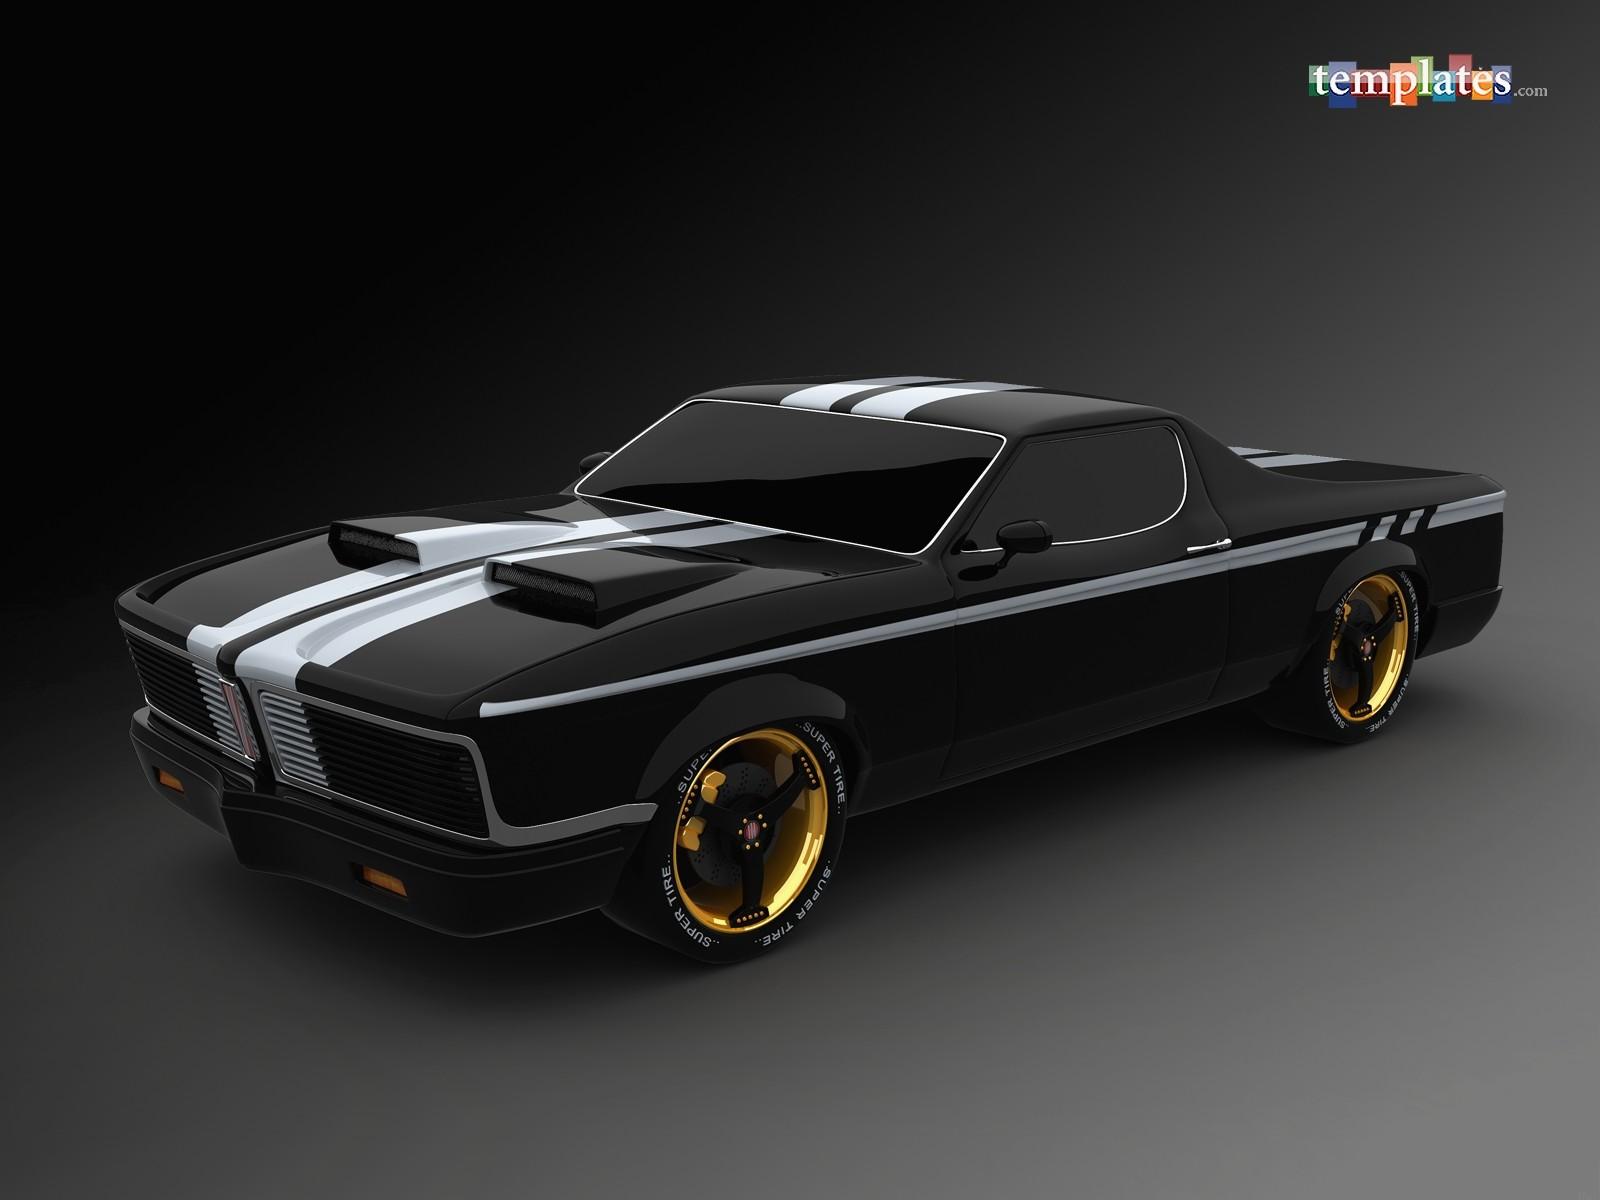 Laptop Live Wallpaper Hd - Black American Muscle Cars , HD Wallpaper & Backgrounds